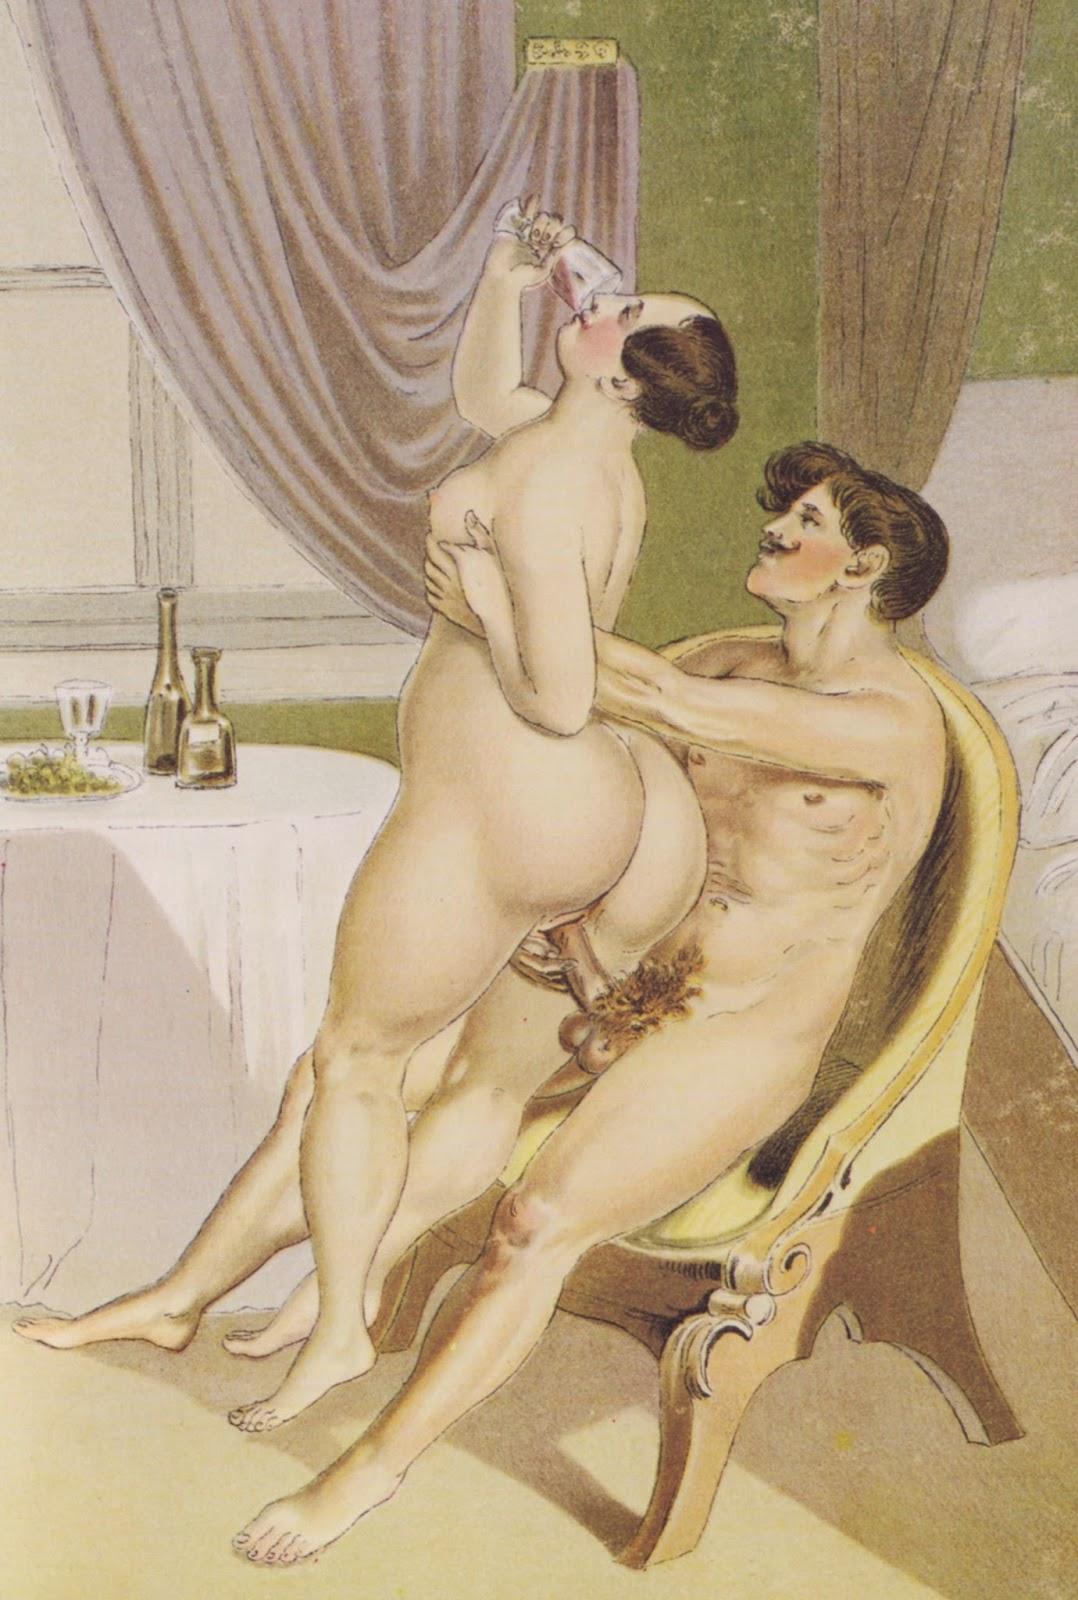 seks-petr-perviy